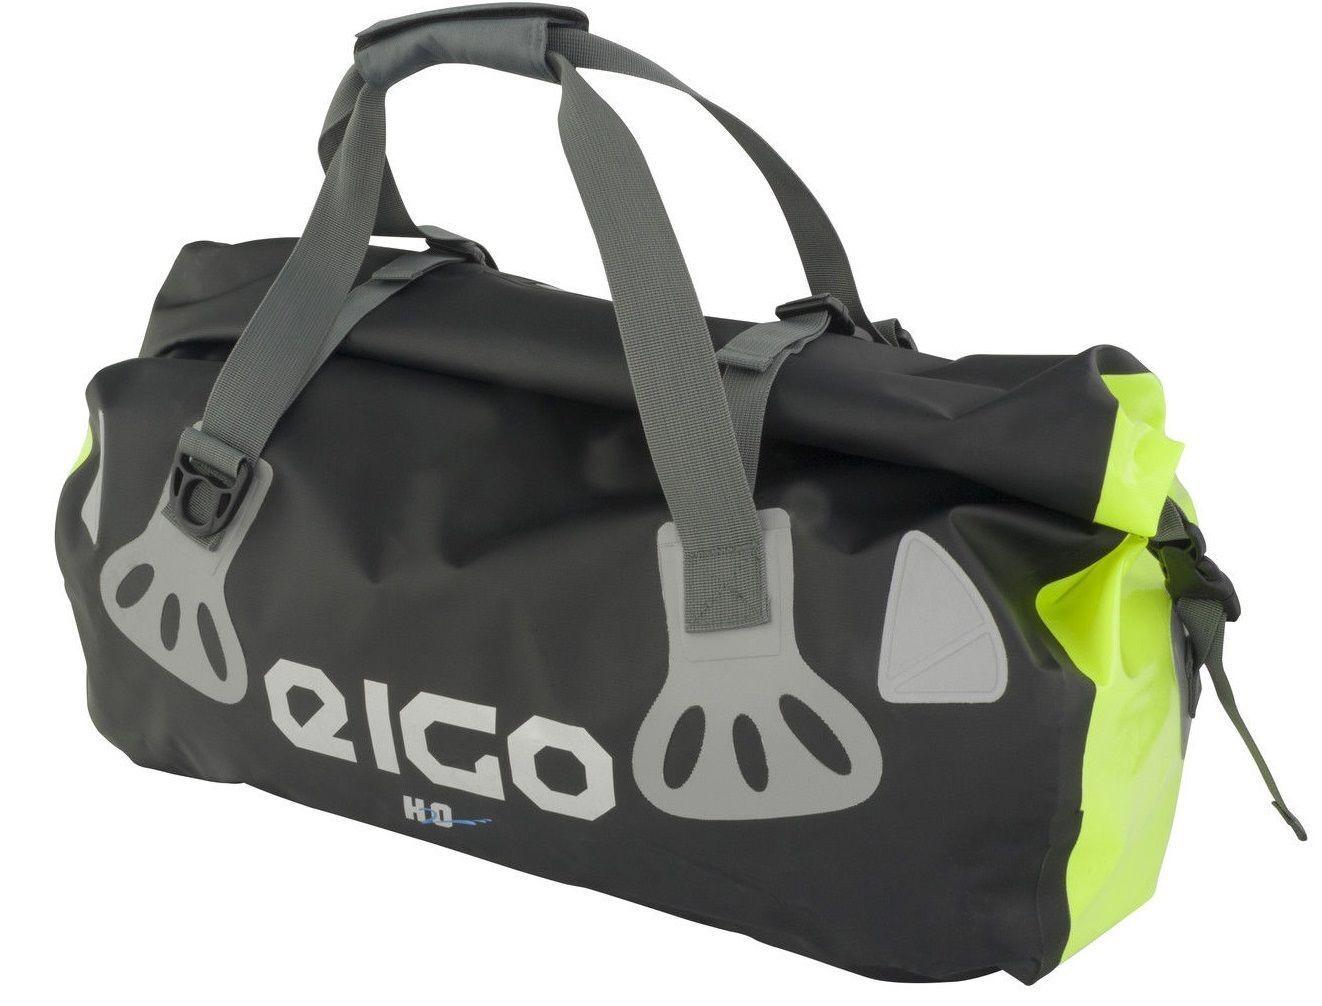 NEW EIGO WATERPROOF HOLDALL ROLL BAG 30L FLUgold - CYCLE CYCLING MTB ROAD BIKE